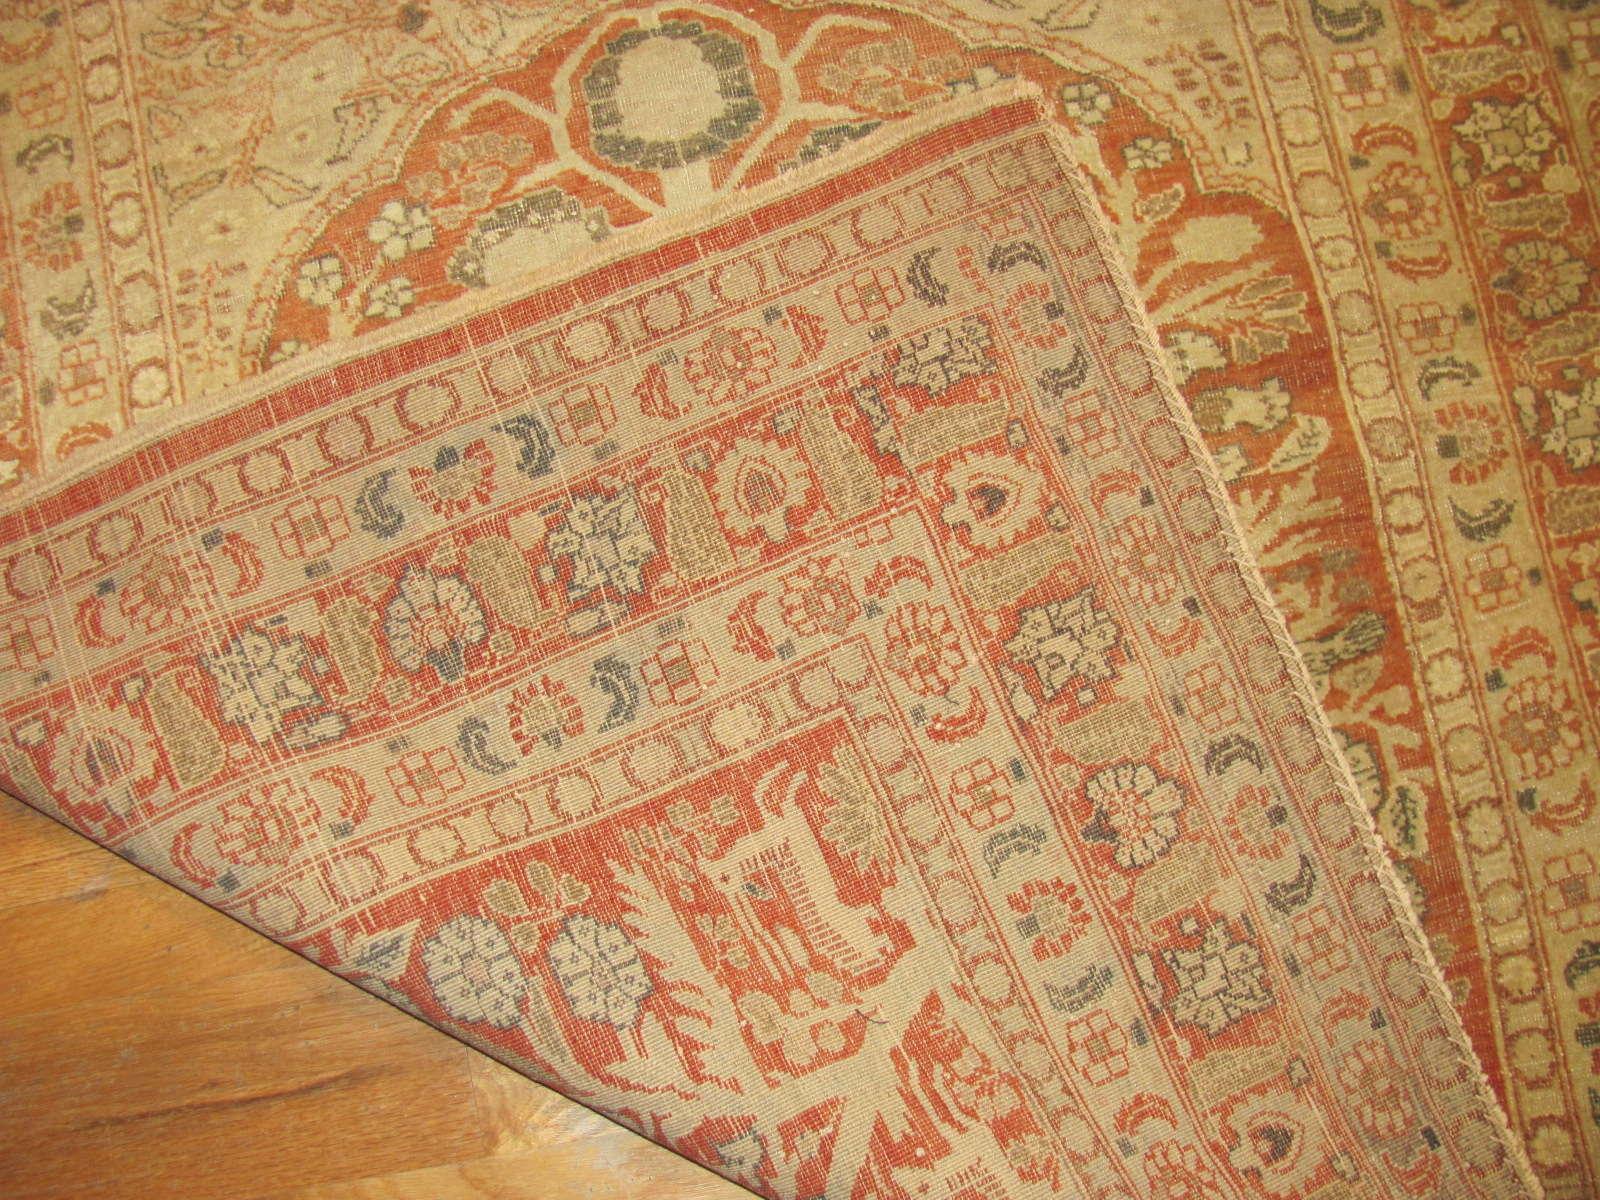 24668 antique persian tabriz prayer rug 4 x 4,8 -2